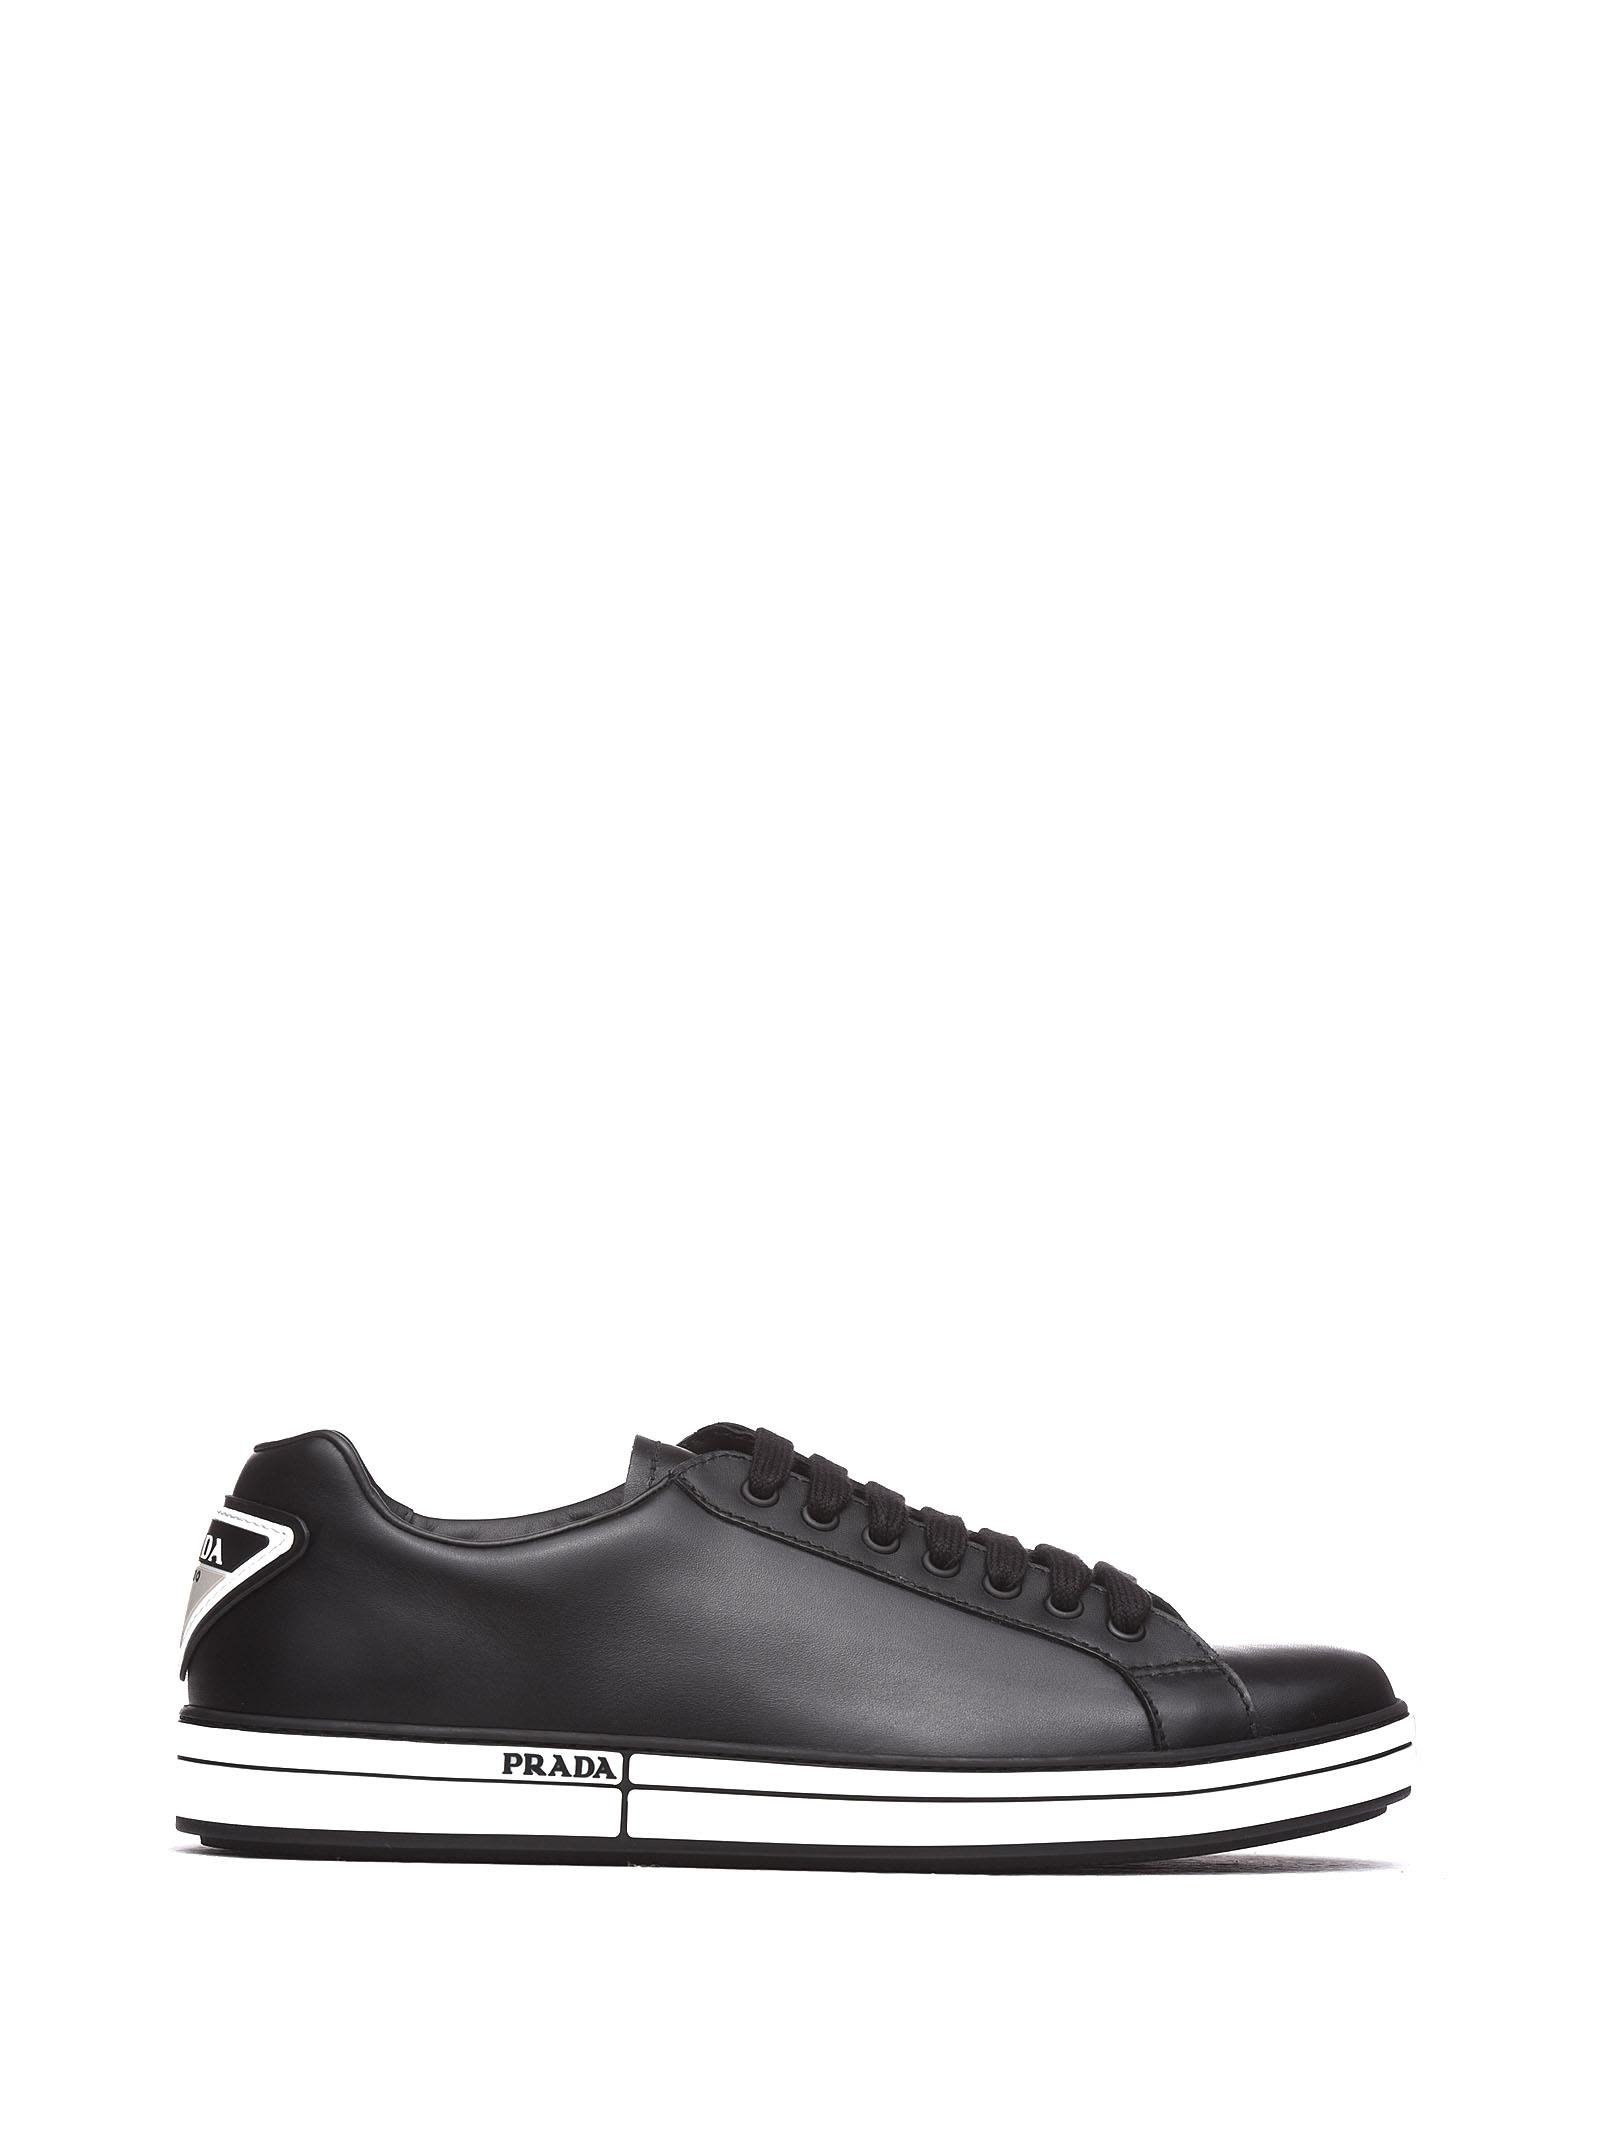 Prada Linea Rossa Black Leather Sneakers